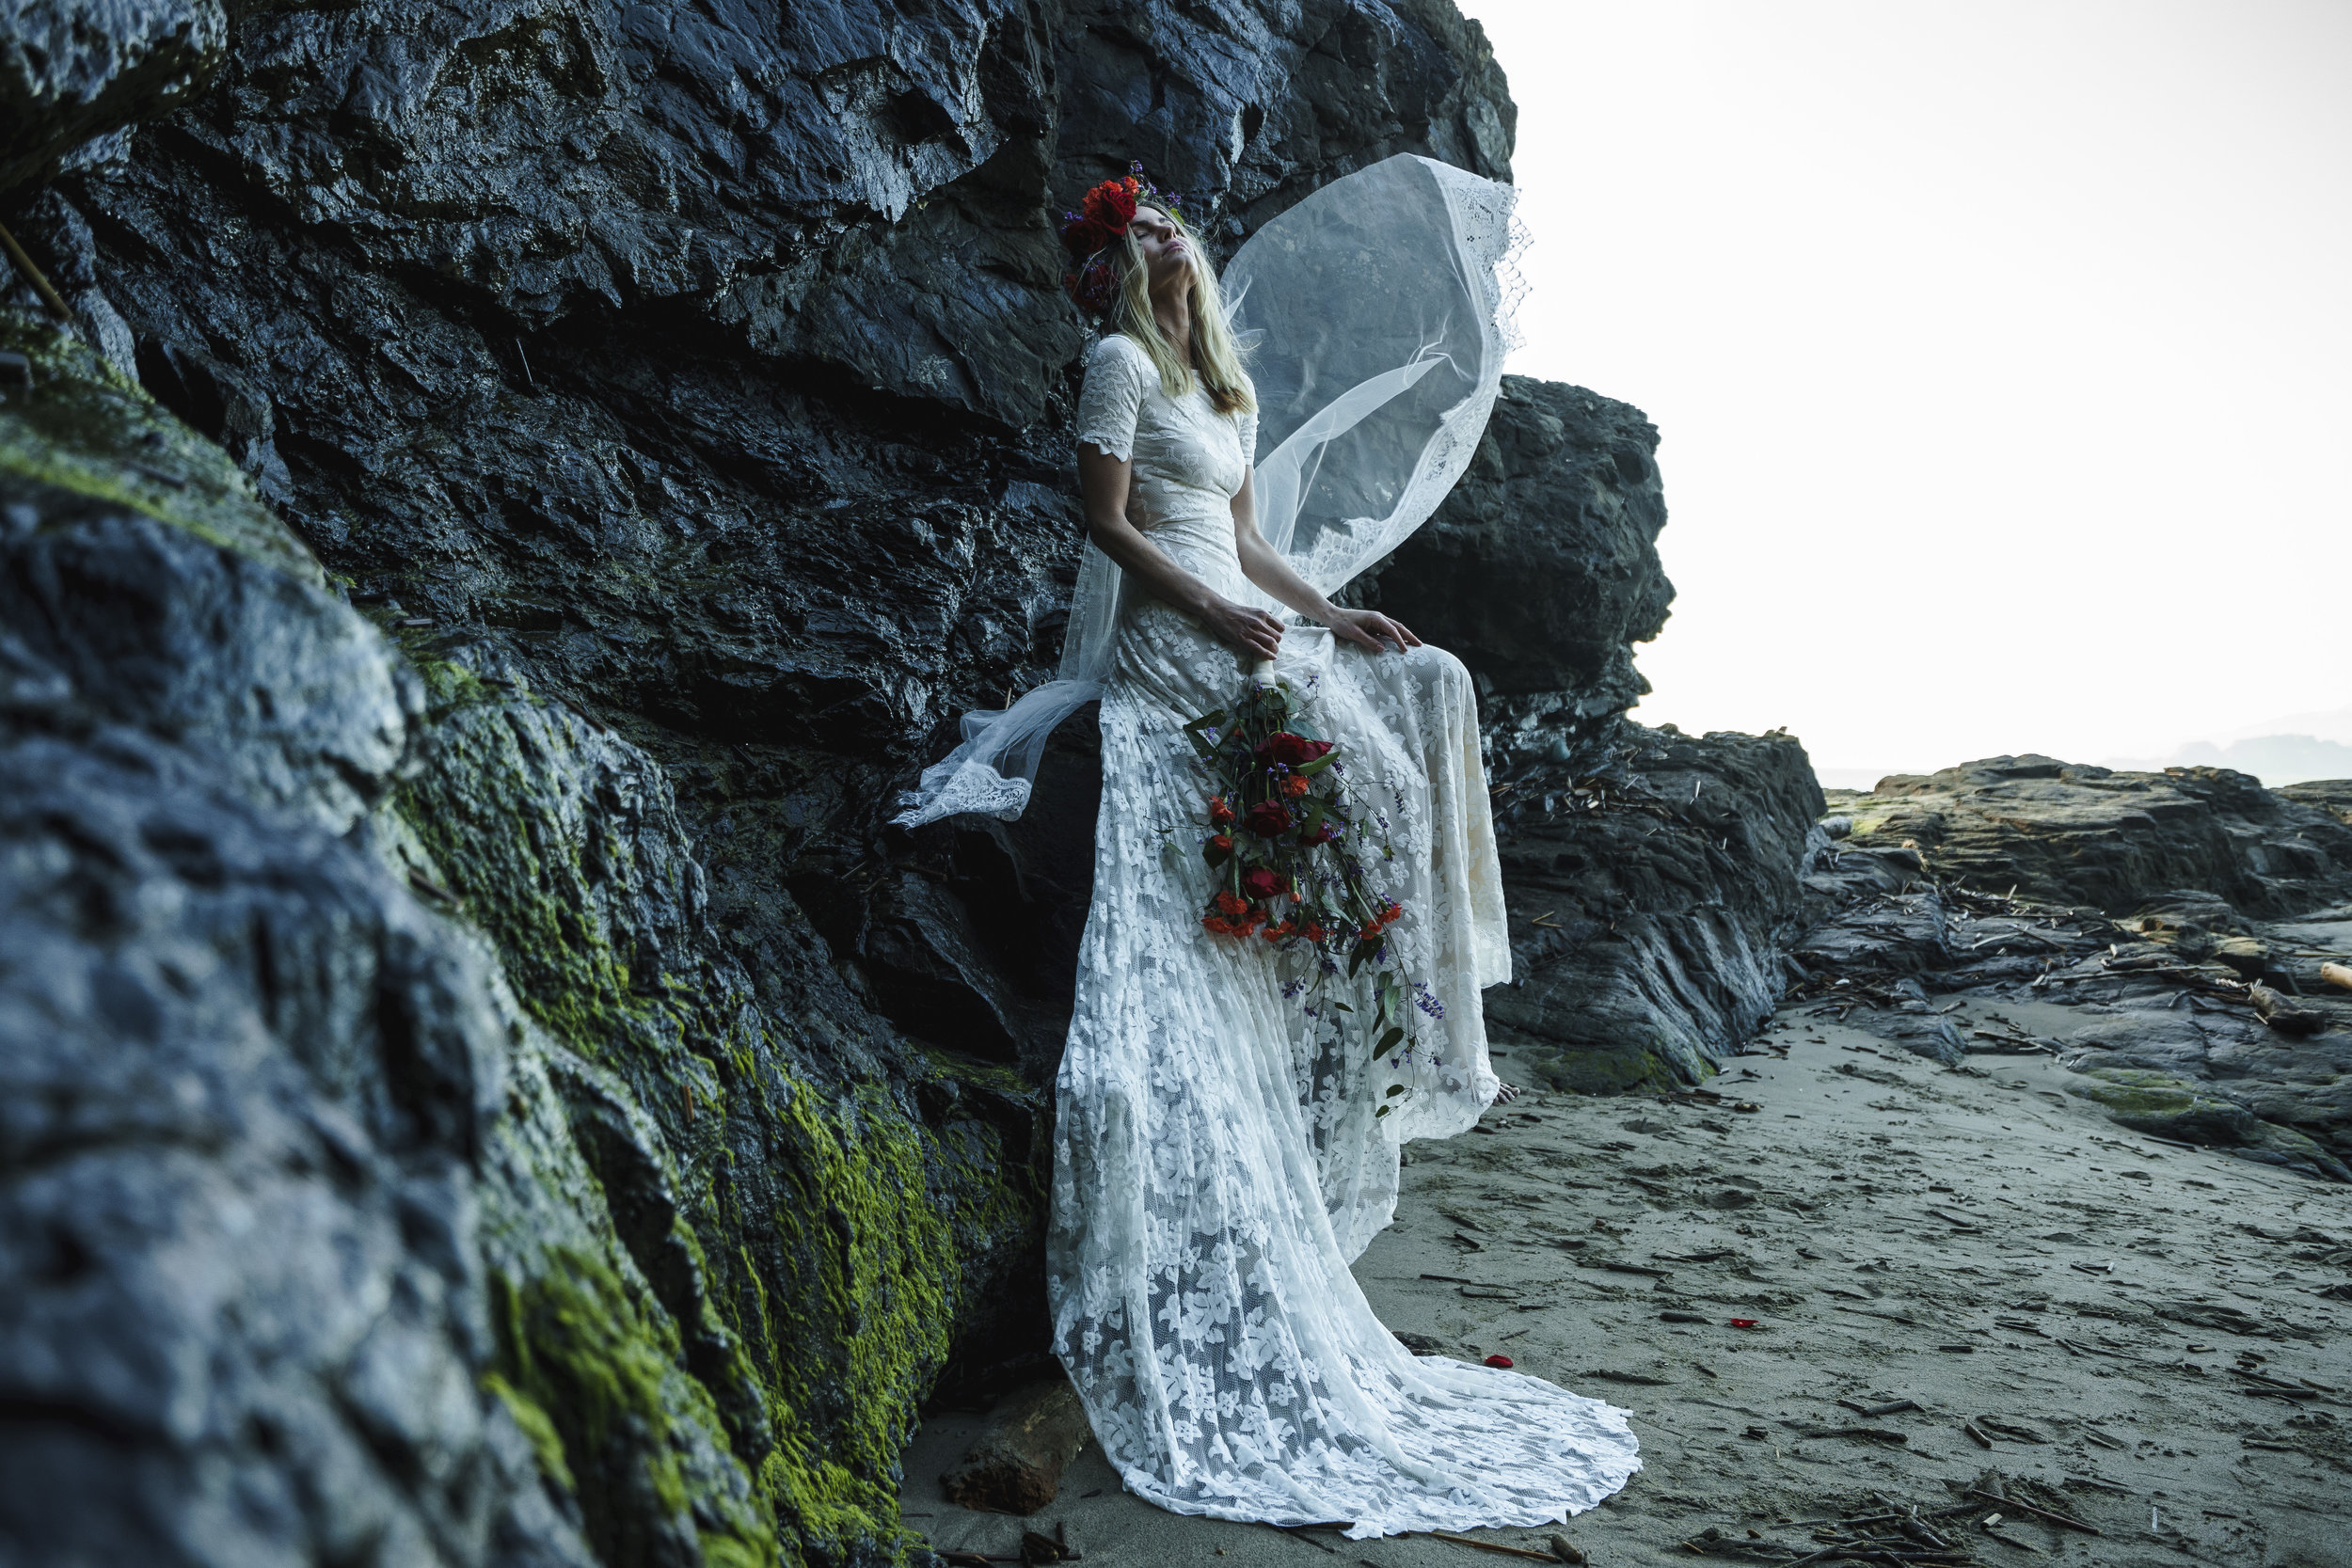 WEAR YOUR LOVE XO 2018 - Starring Kimberly Cozzens